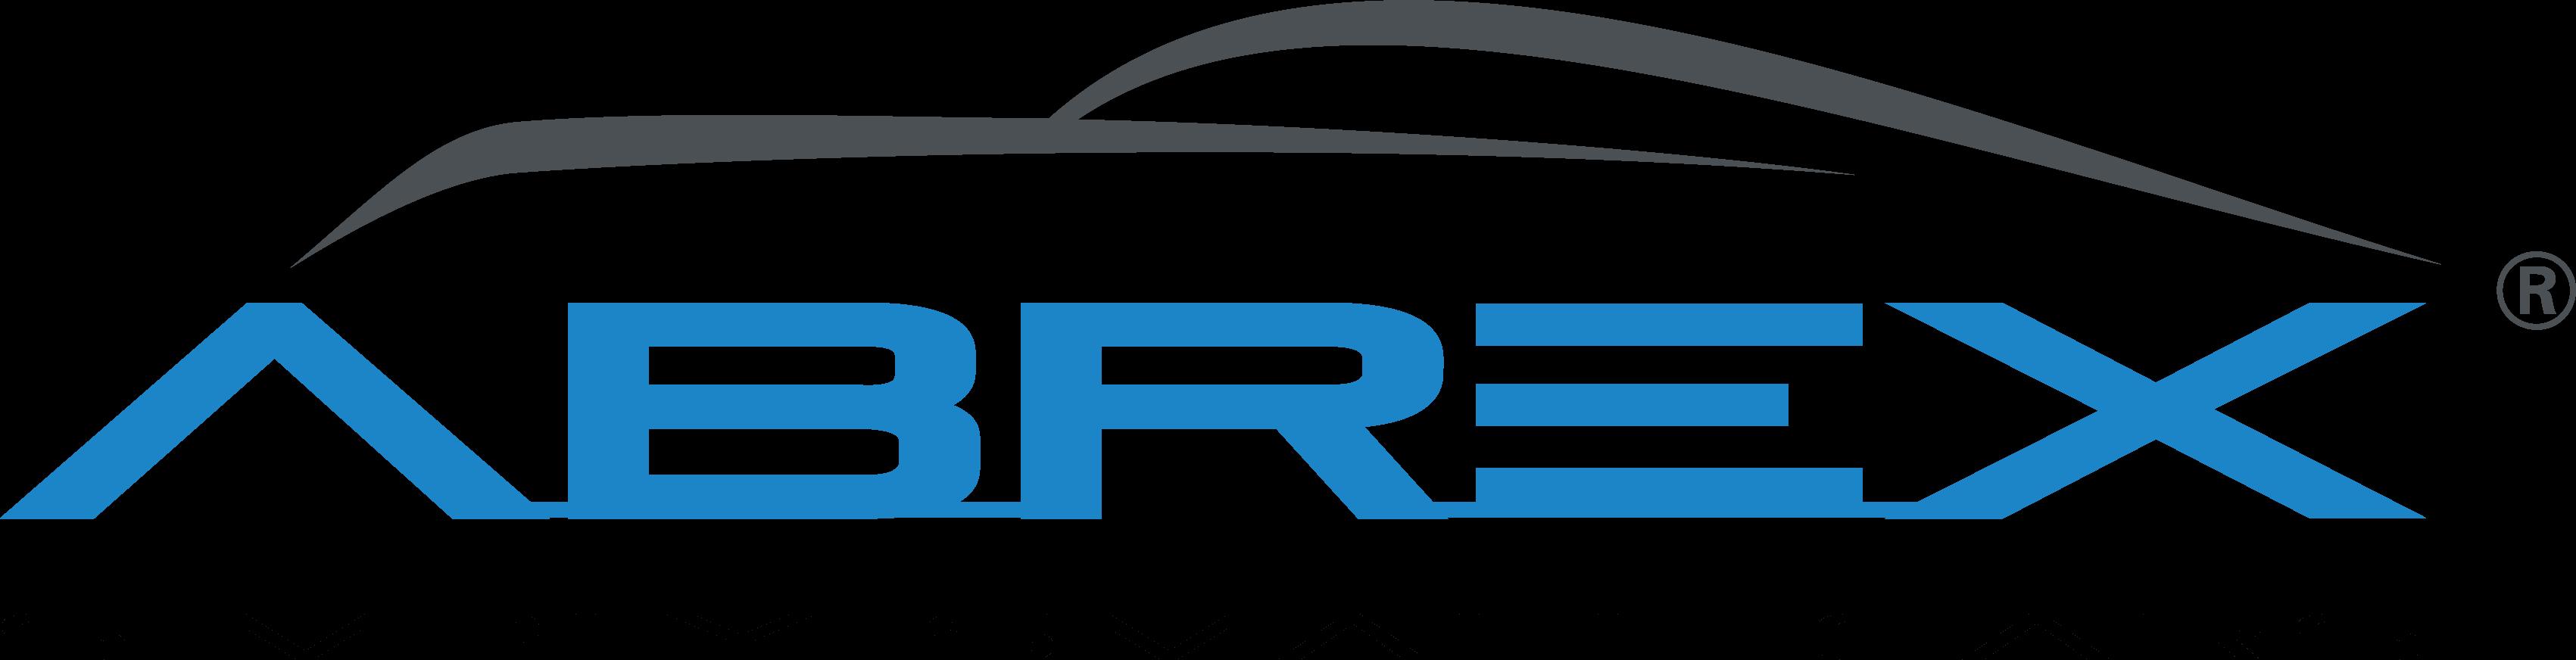 Abrex s.r.o.